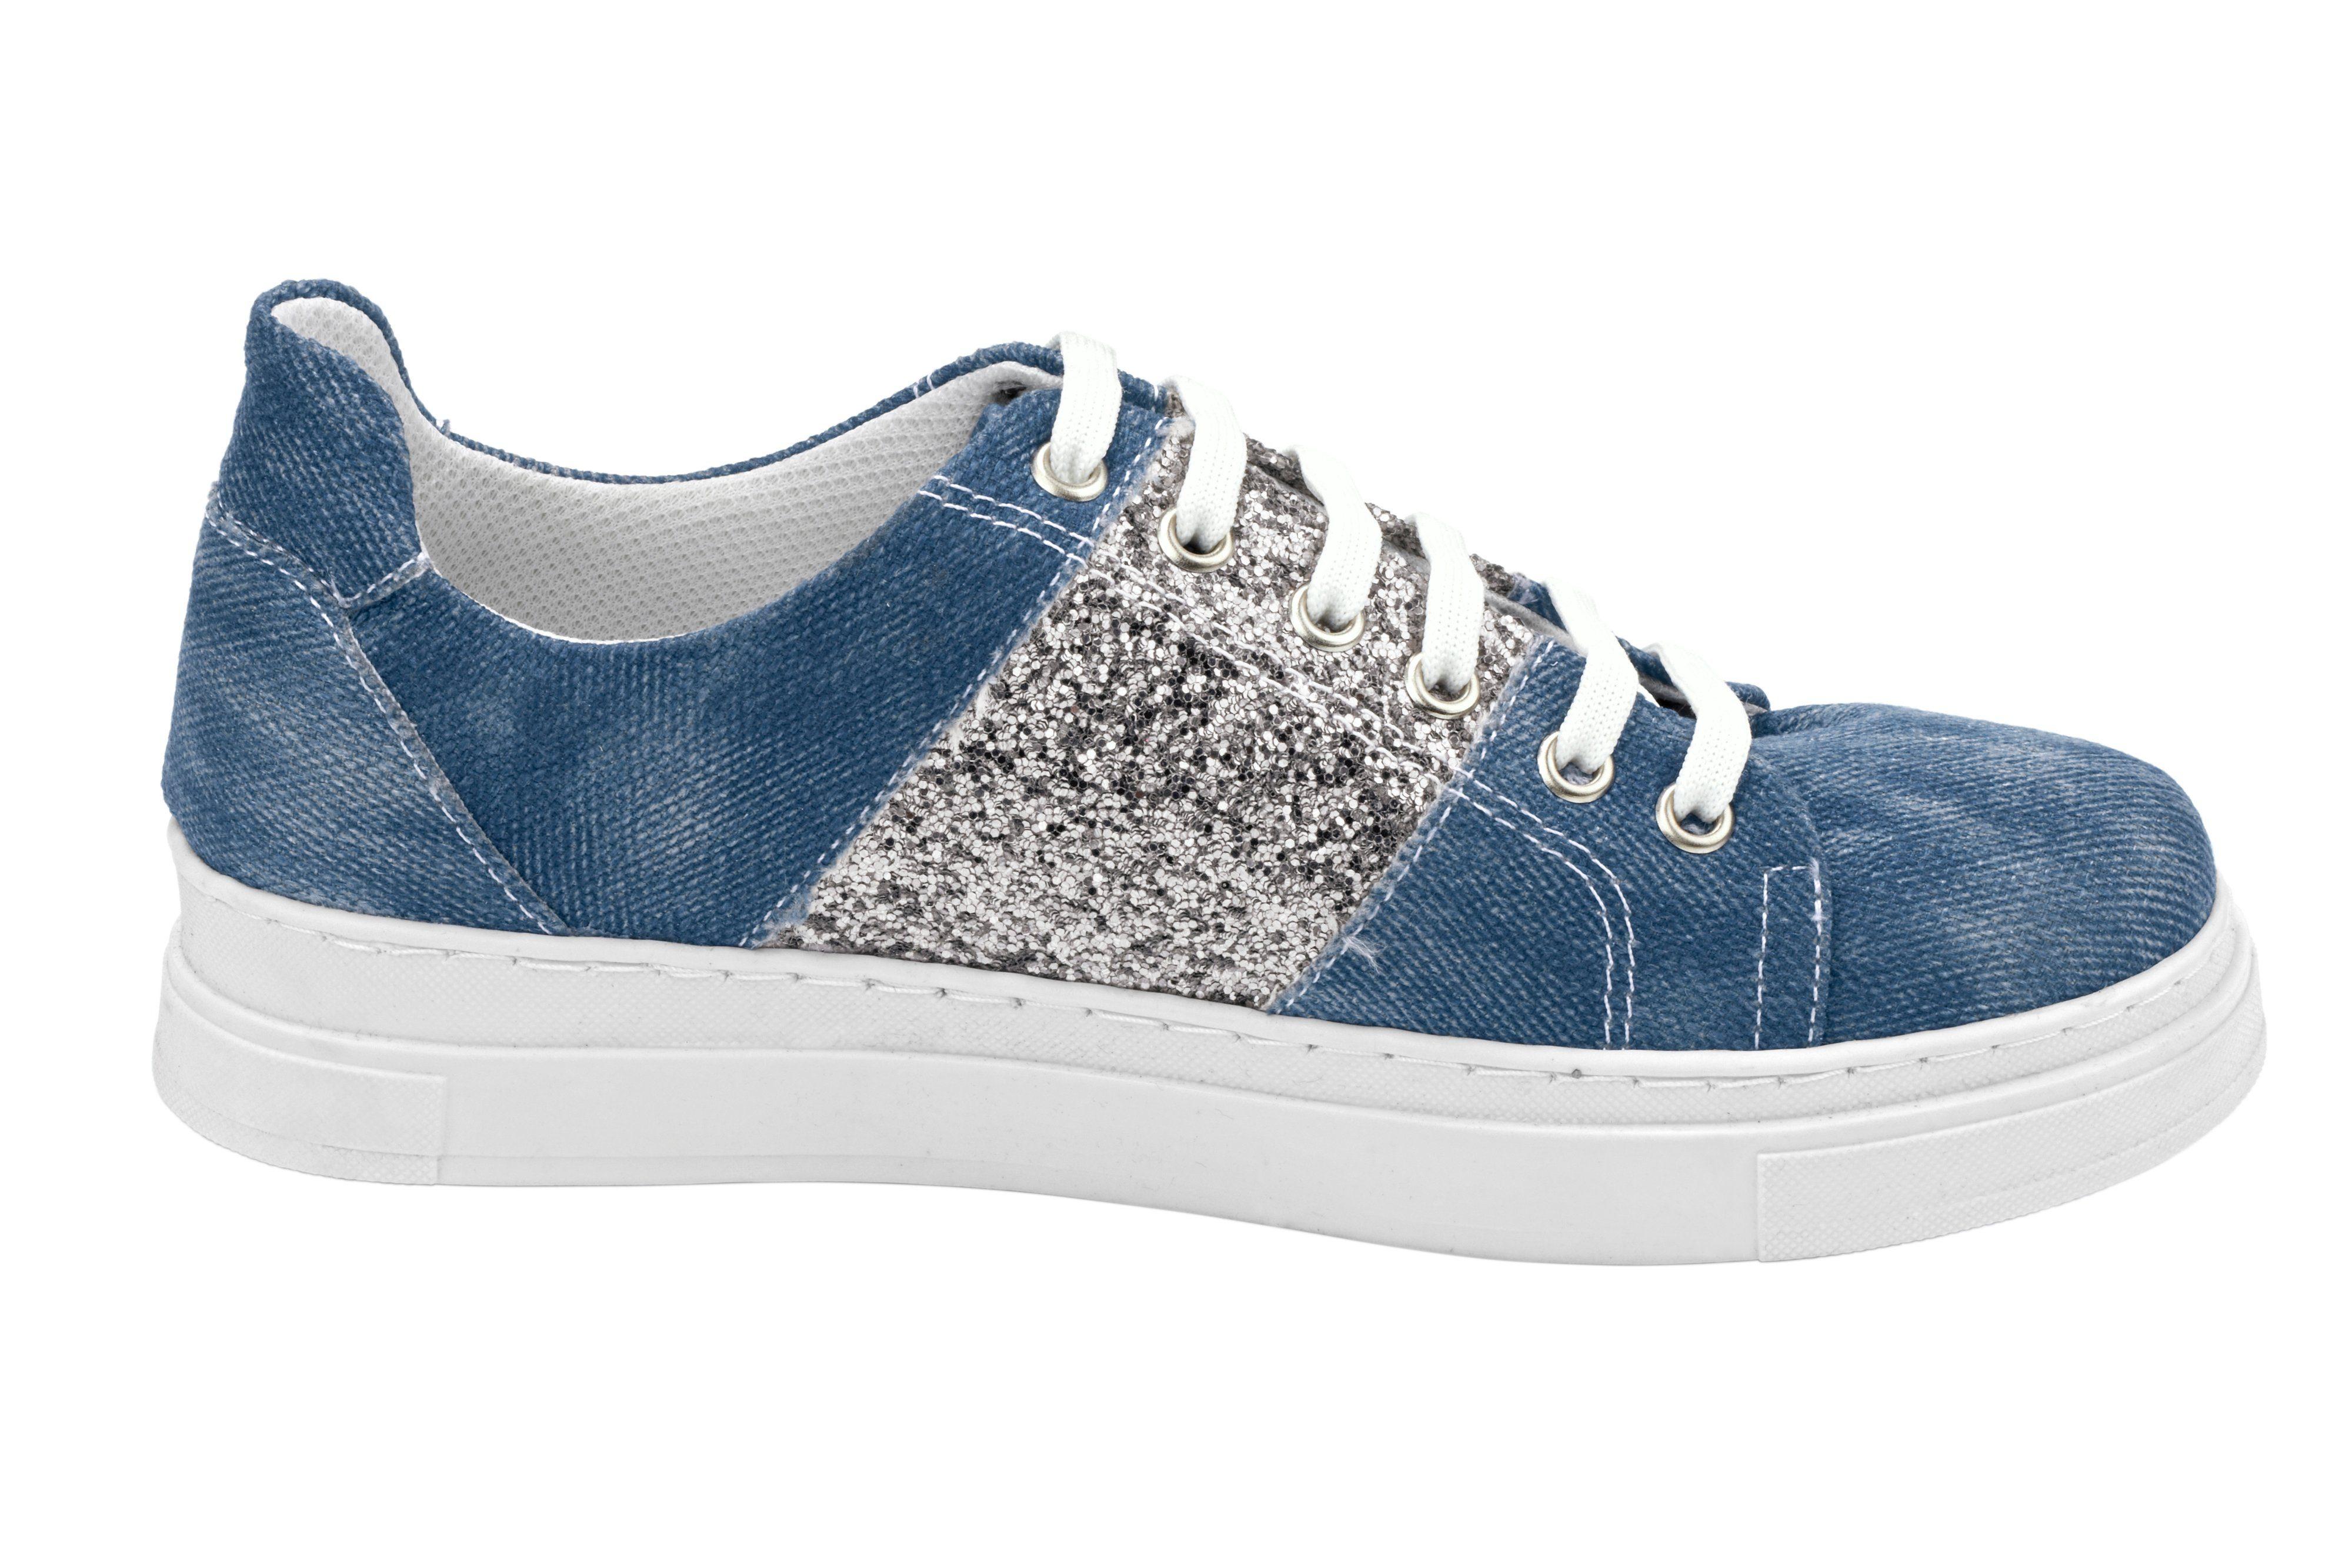 Sneaker Mit Andrea Conti Glitzereinsatz Kaufen I7gY6fybvm